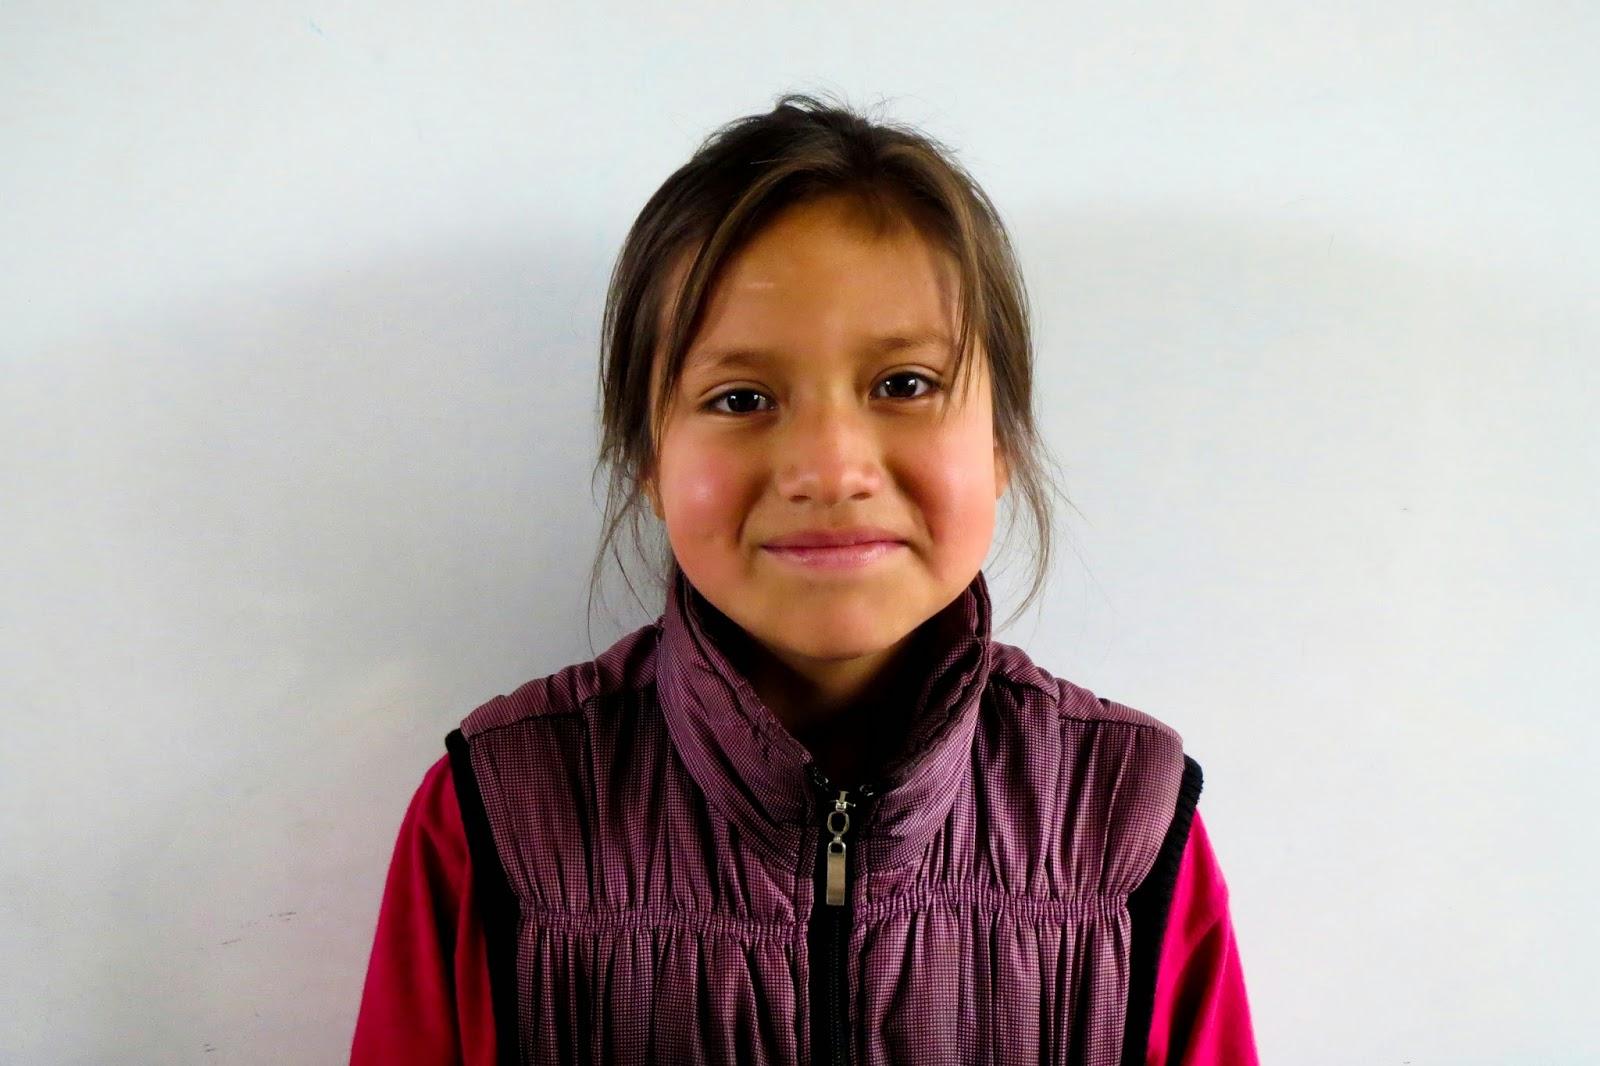 Francisca, Age 9